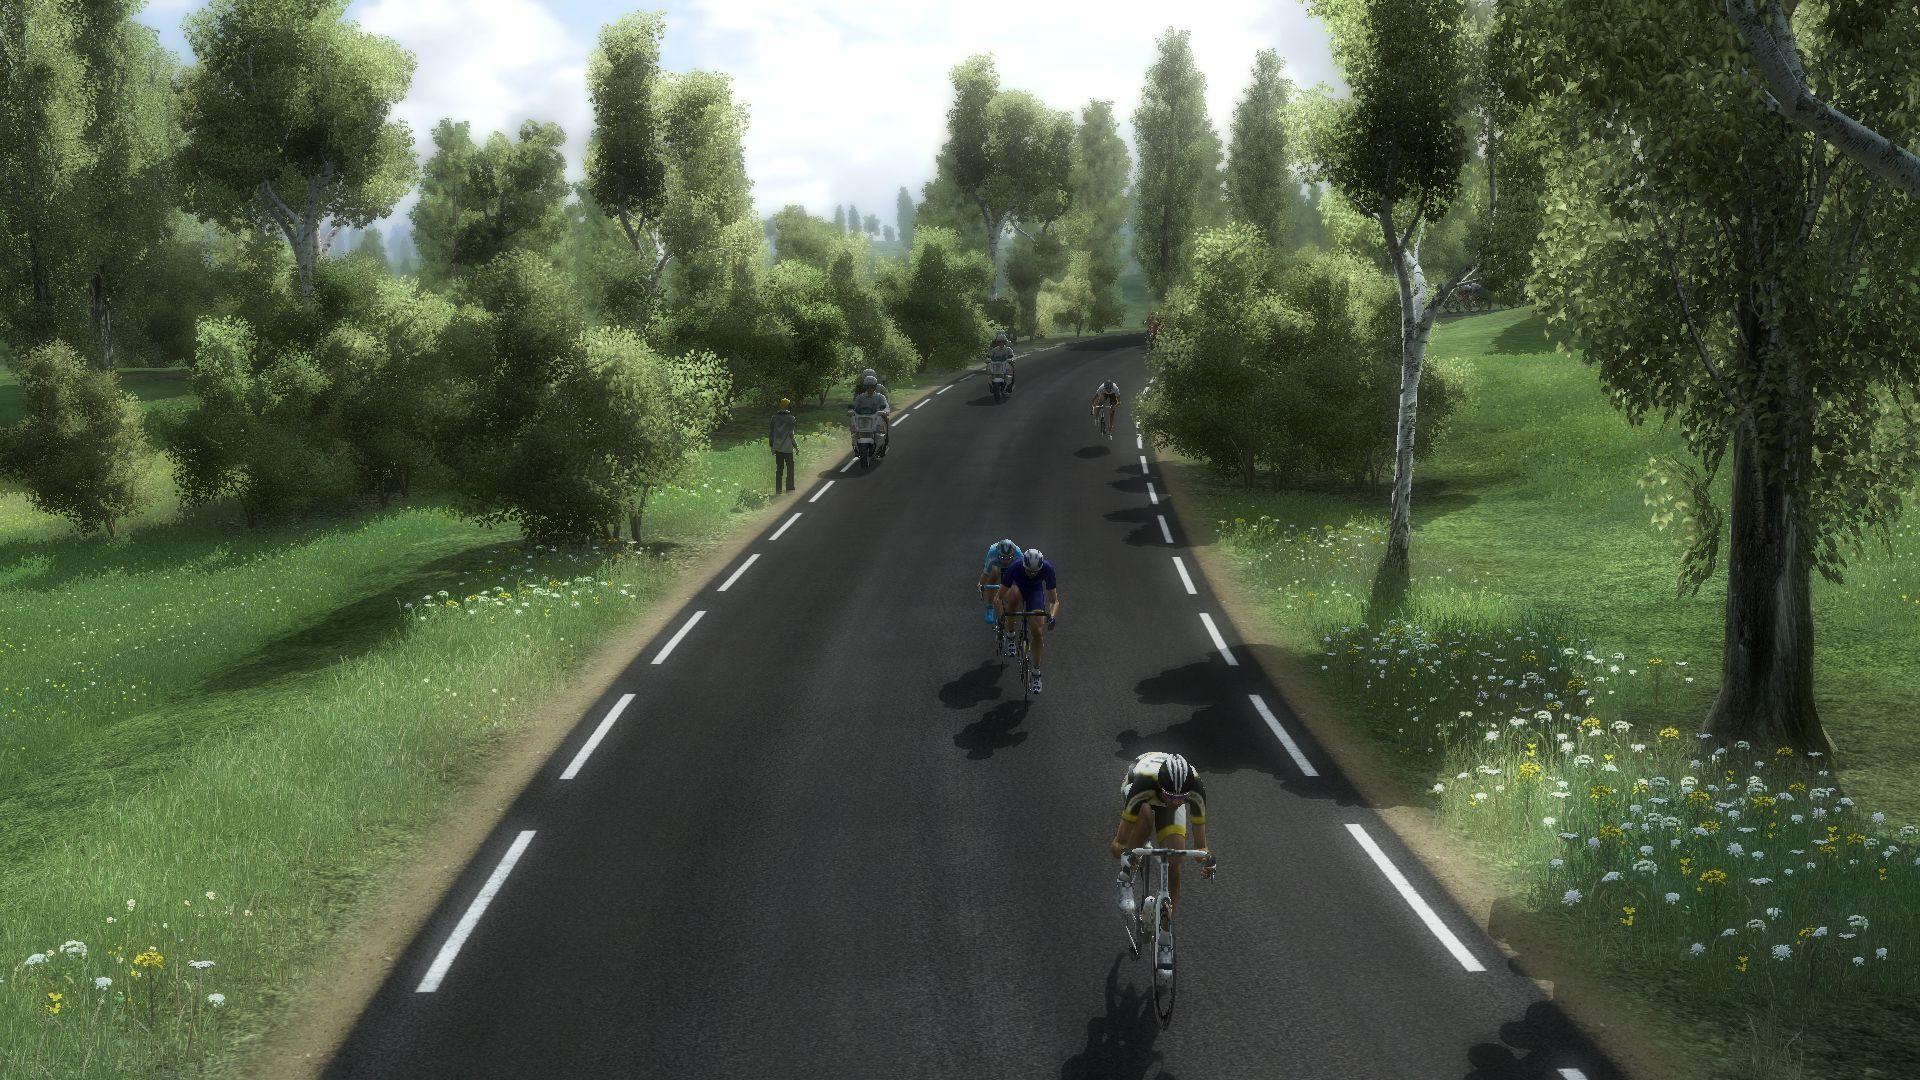 pcmdaily.com/images/mg/2017/Races/PT/TONE/TNES3%2017.jpg